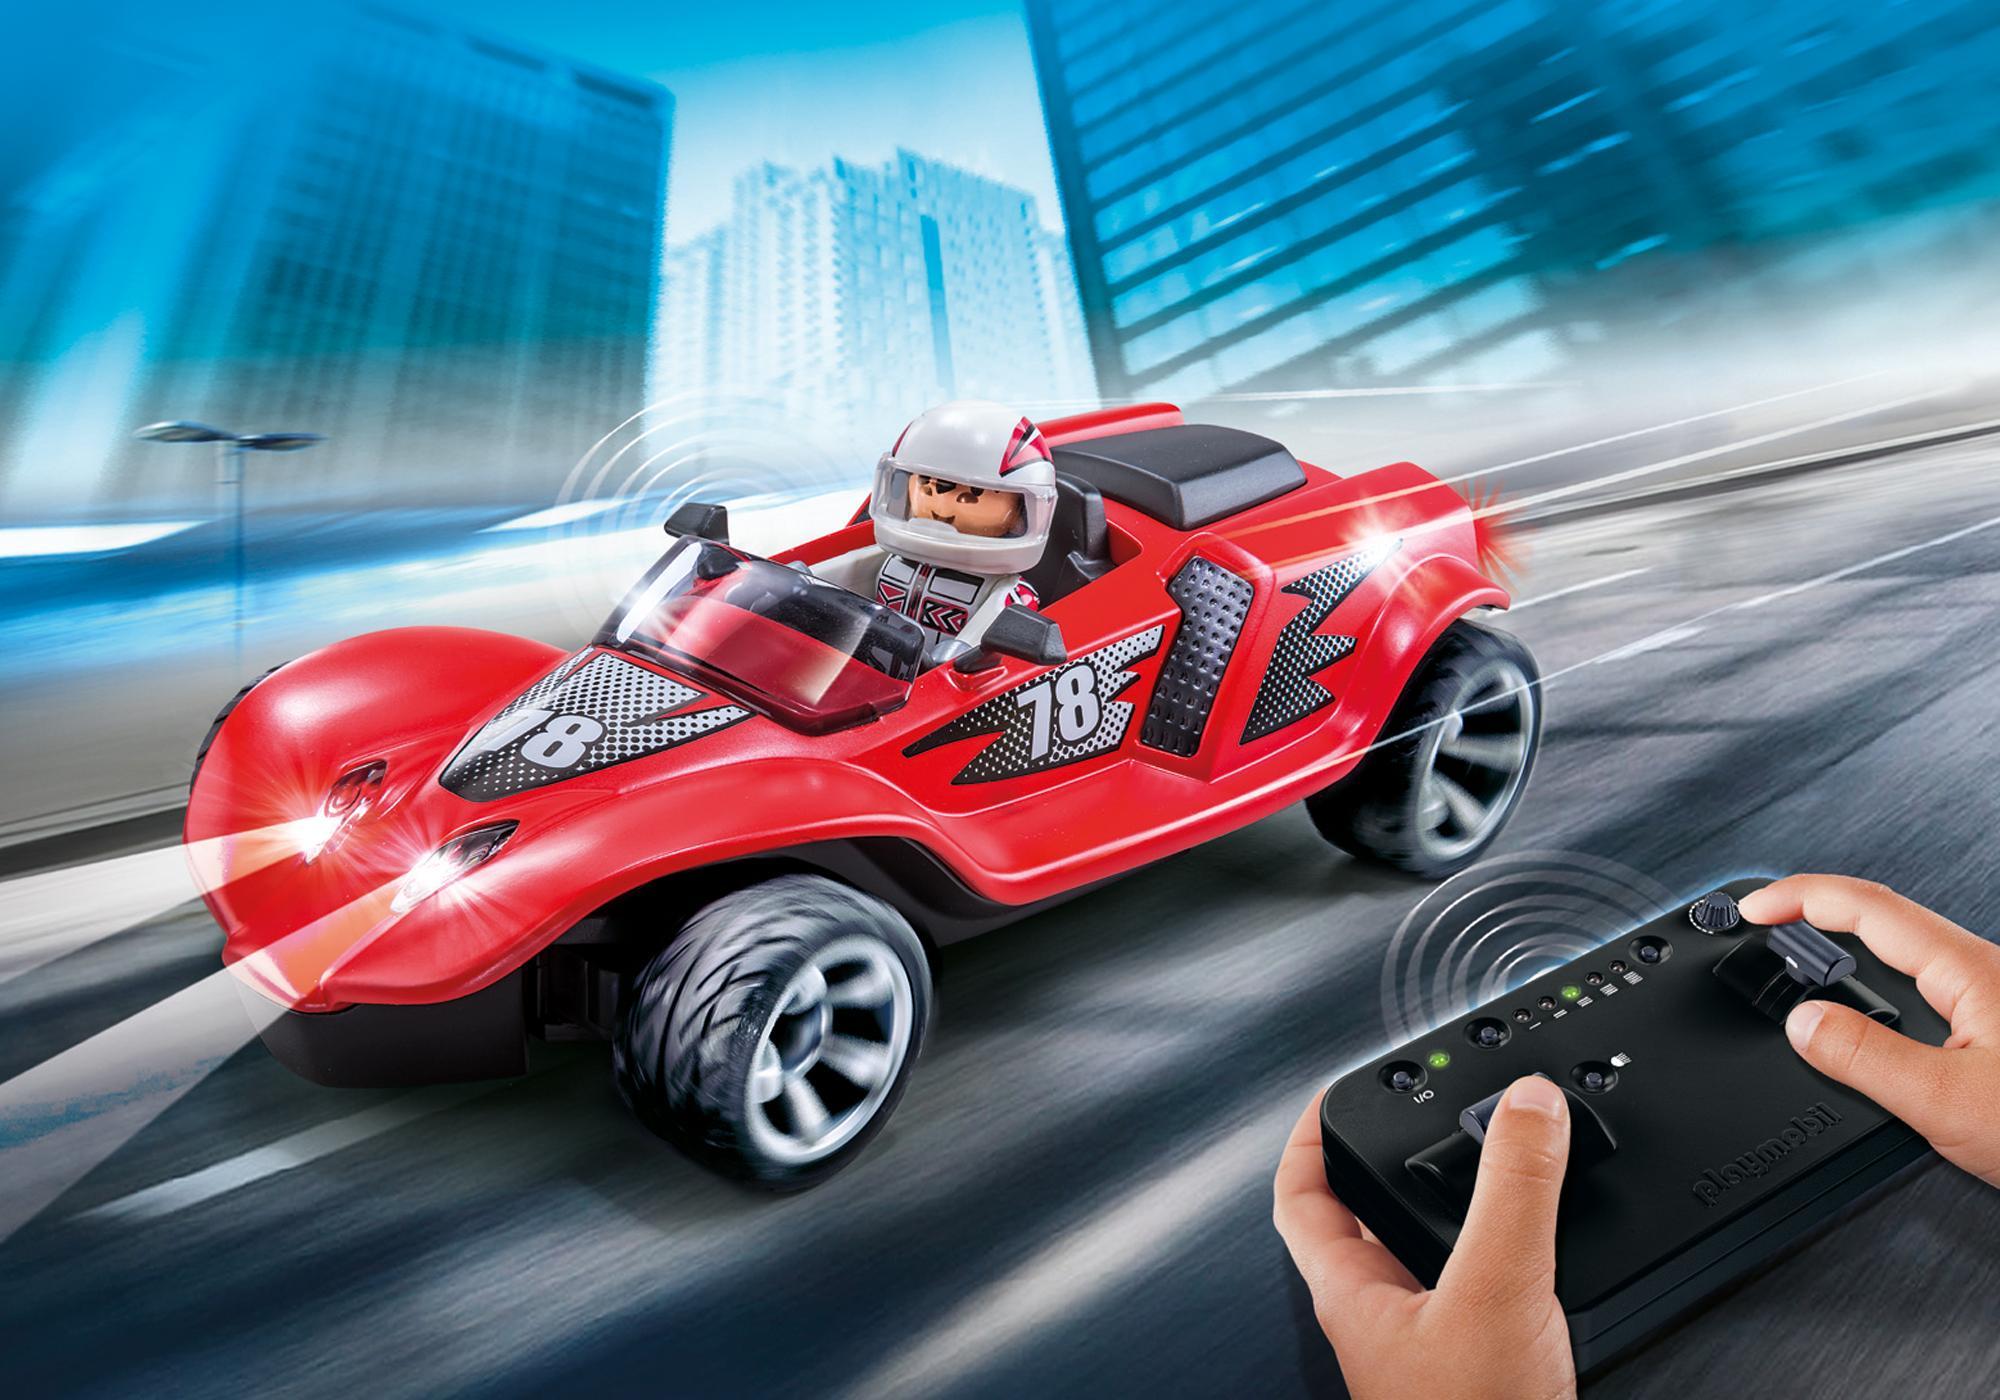 http://media.playmobil.com/i/playmobil/9090_product_detail/RC Rocket Racer